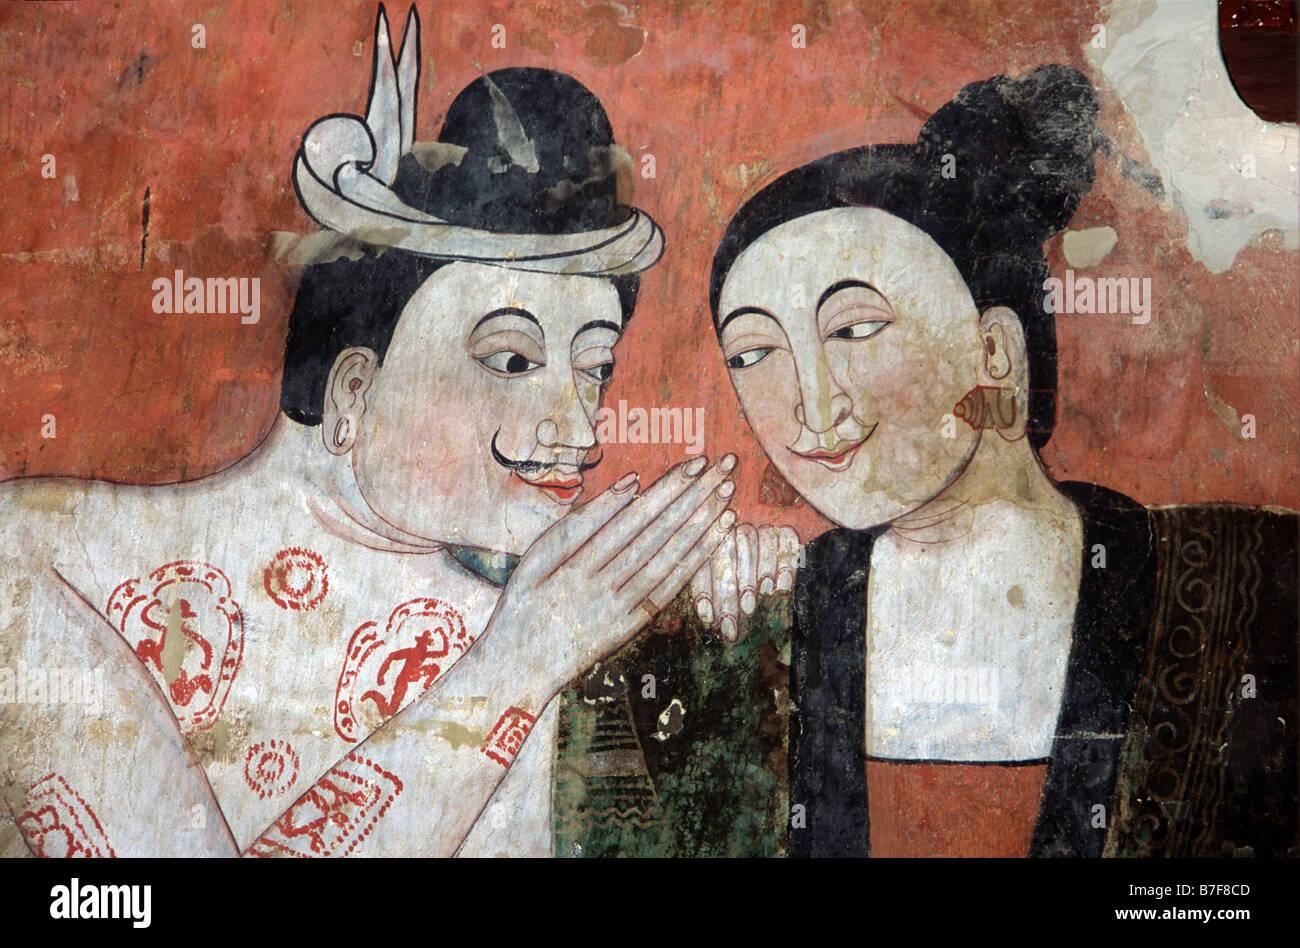 Los amantes tailandés Seducción, c 19º Mural o pared pintada por Thit Buaphan, Wat Phumin templo, Imagen De Stock